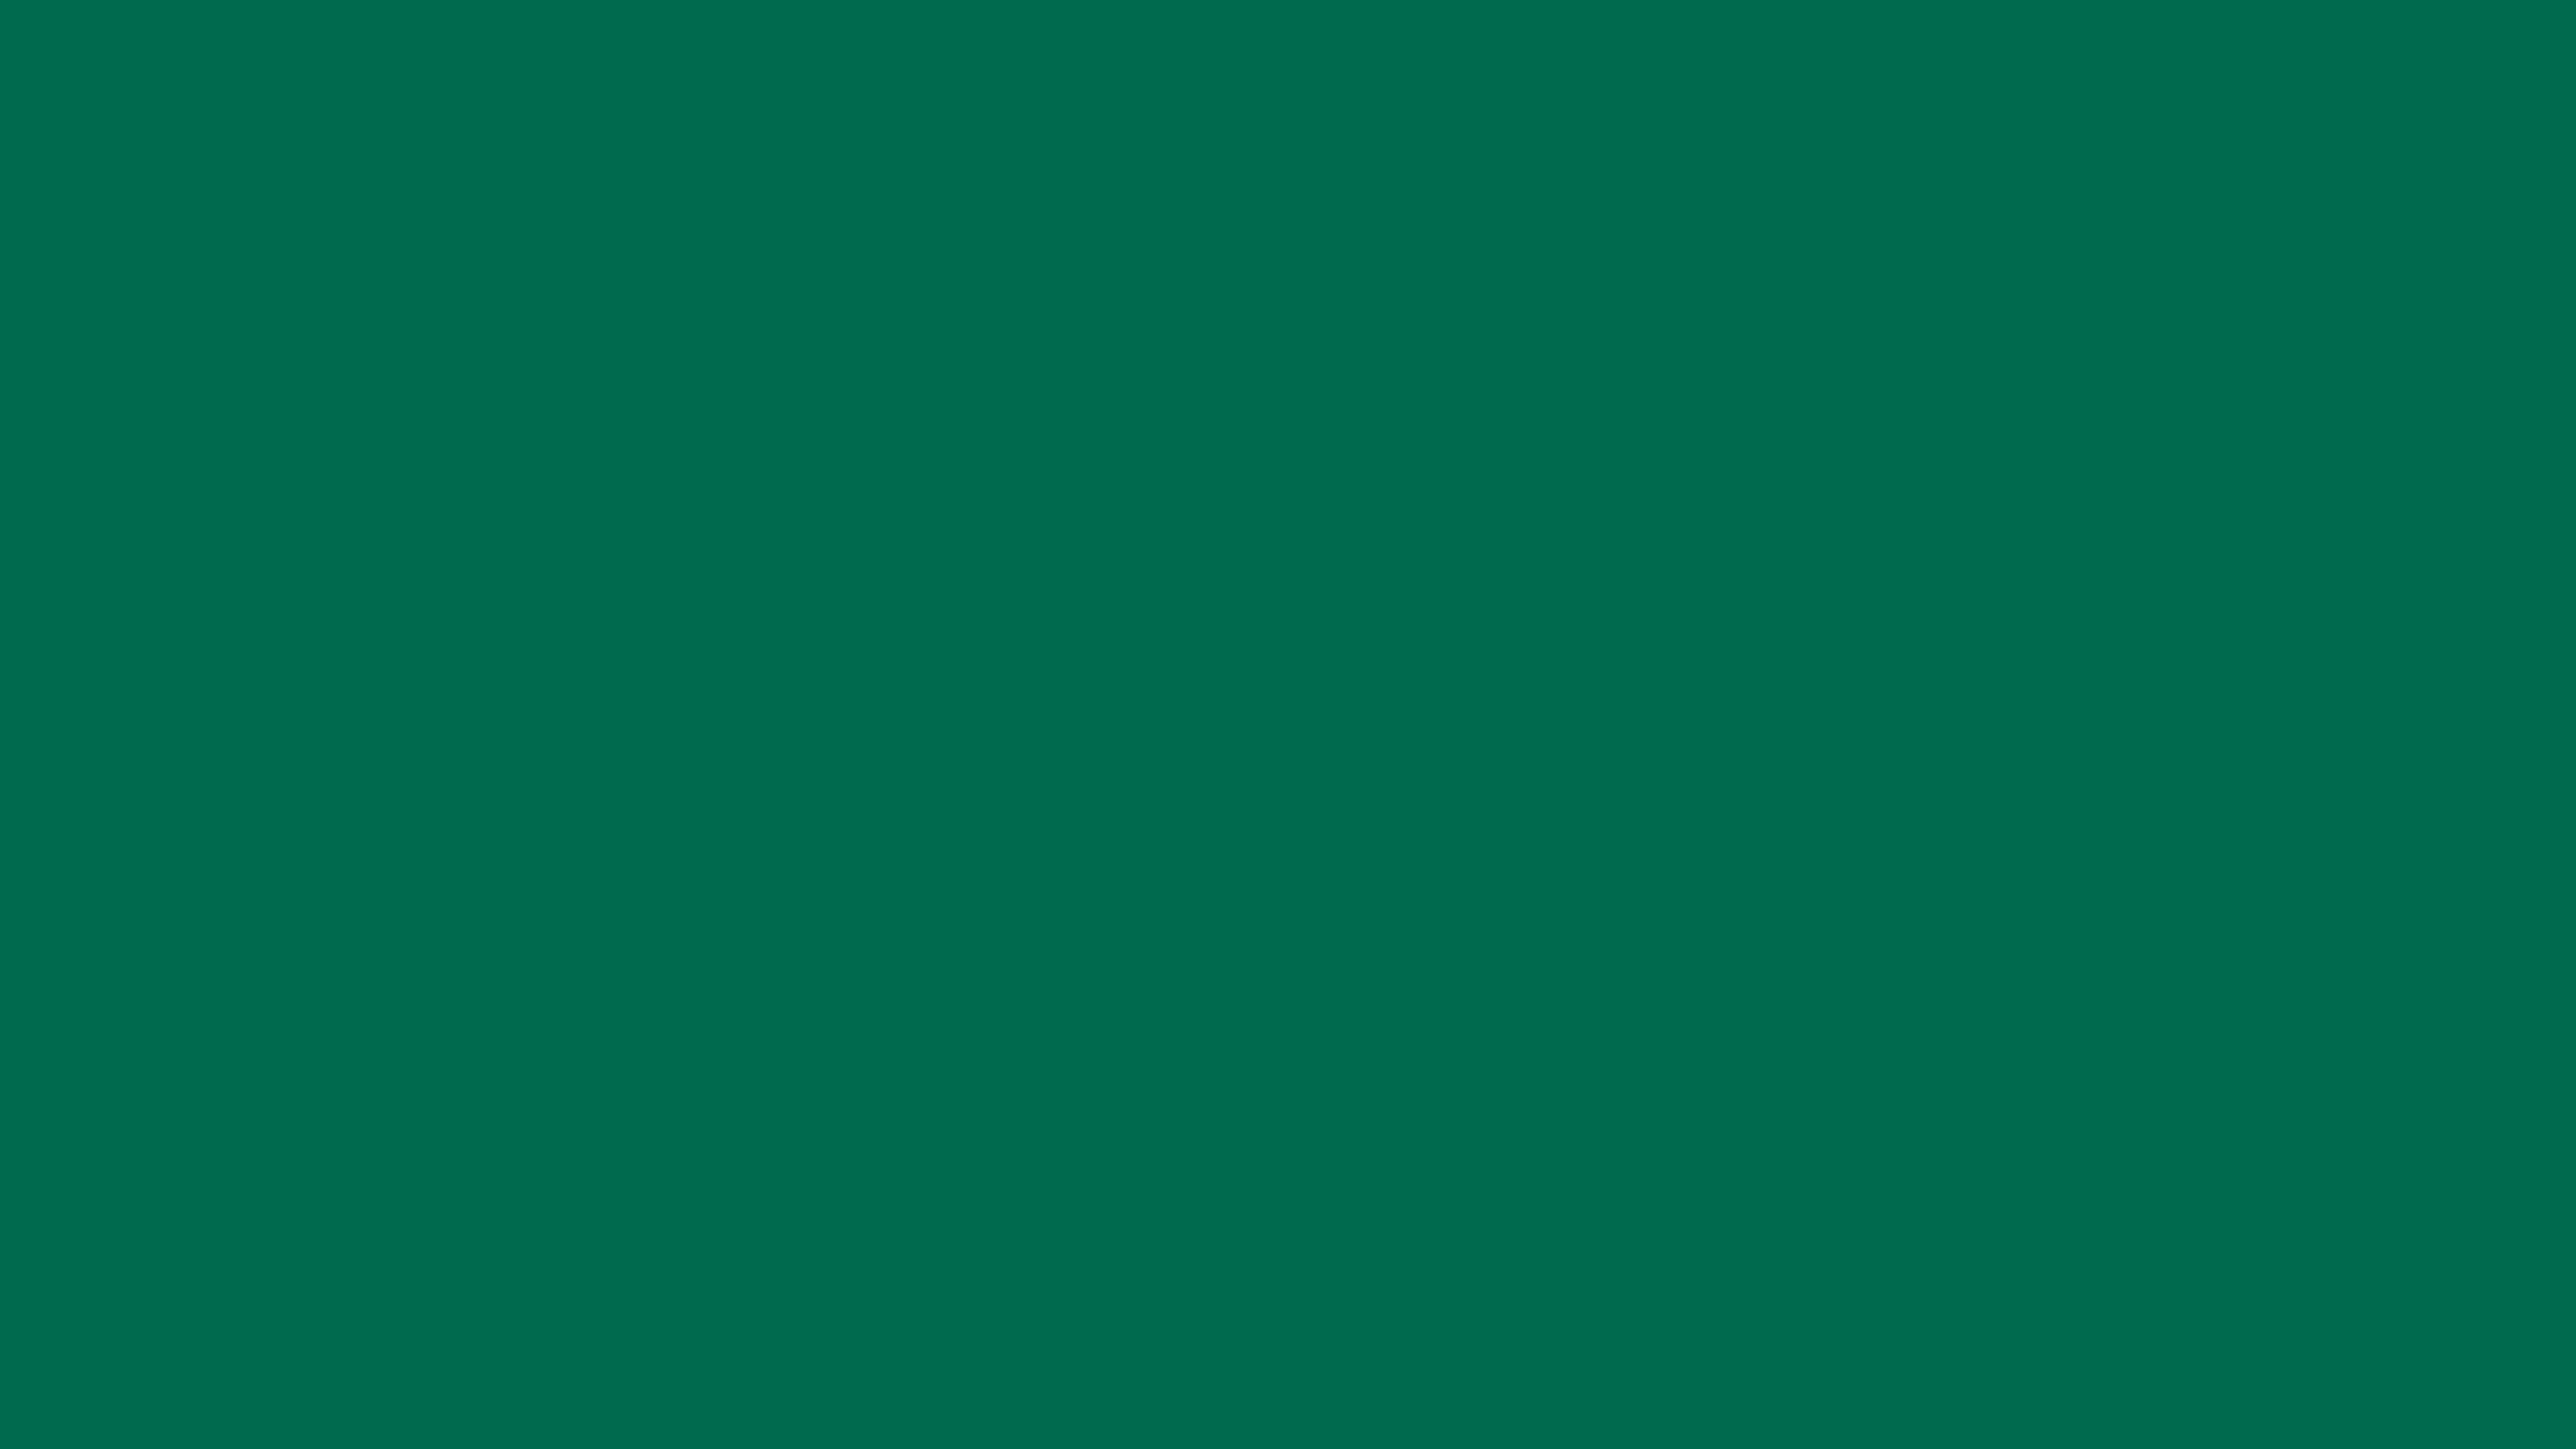 3840x2160 Bottle Green Solid Color Background